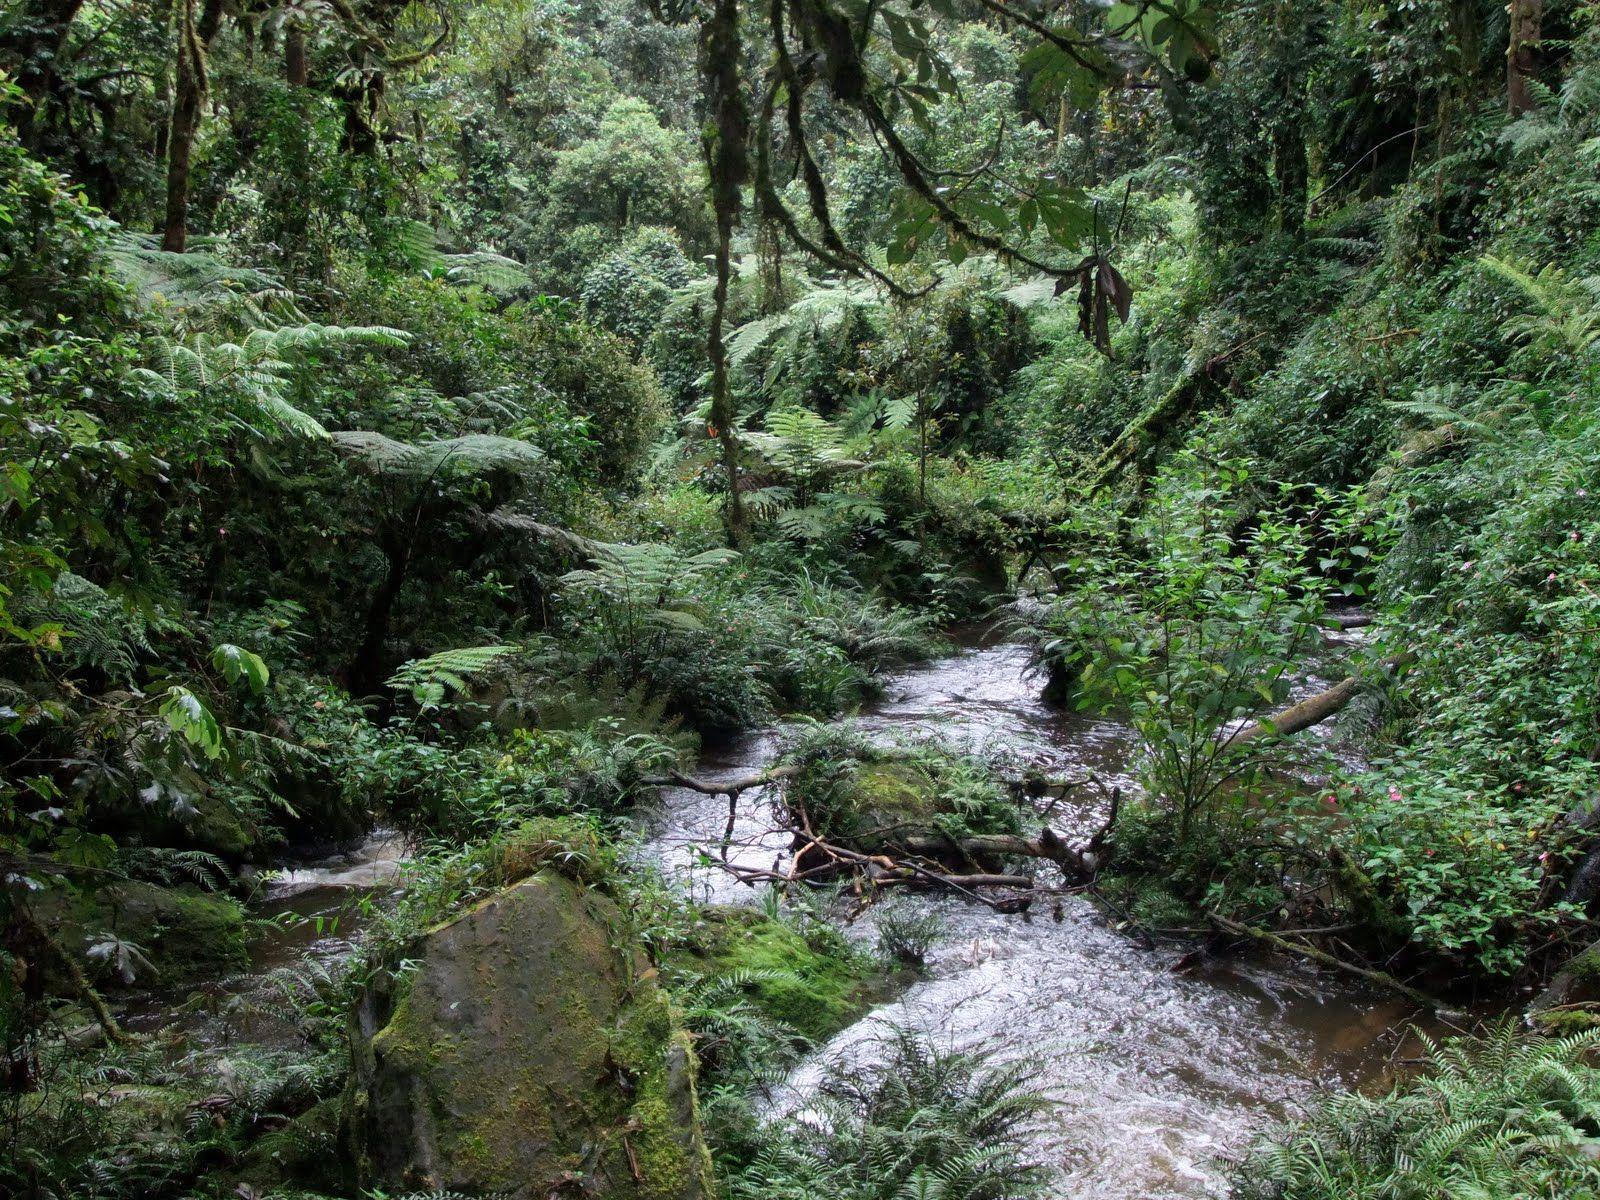 east african rainforest - Google Search | Places | Pinterest ...